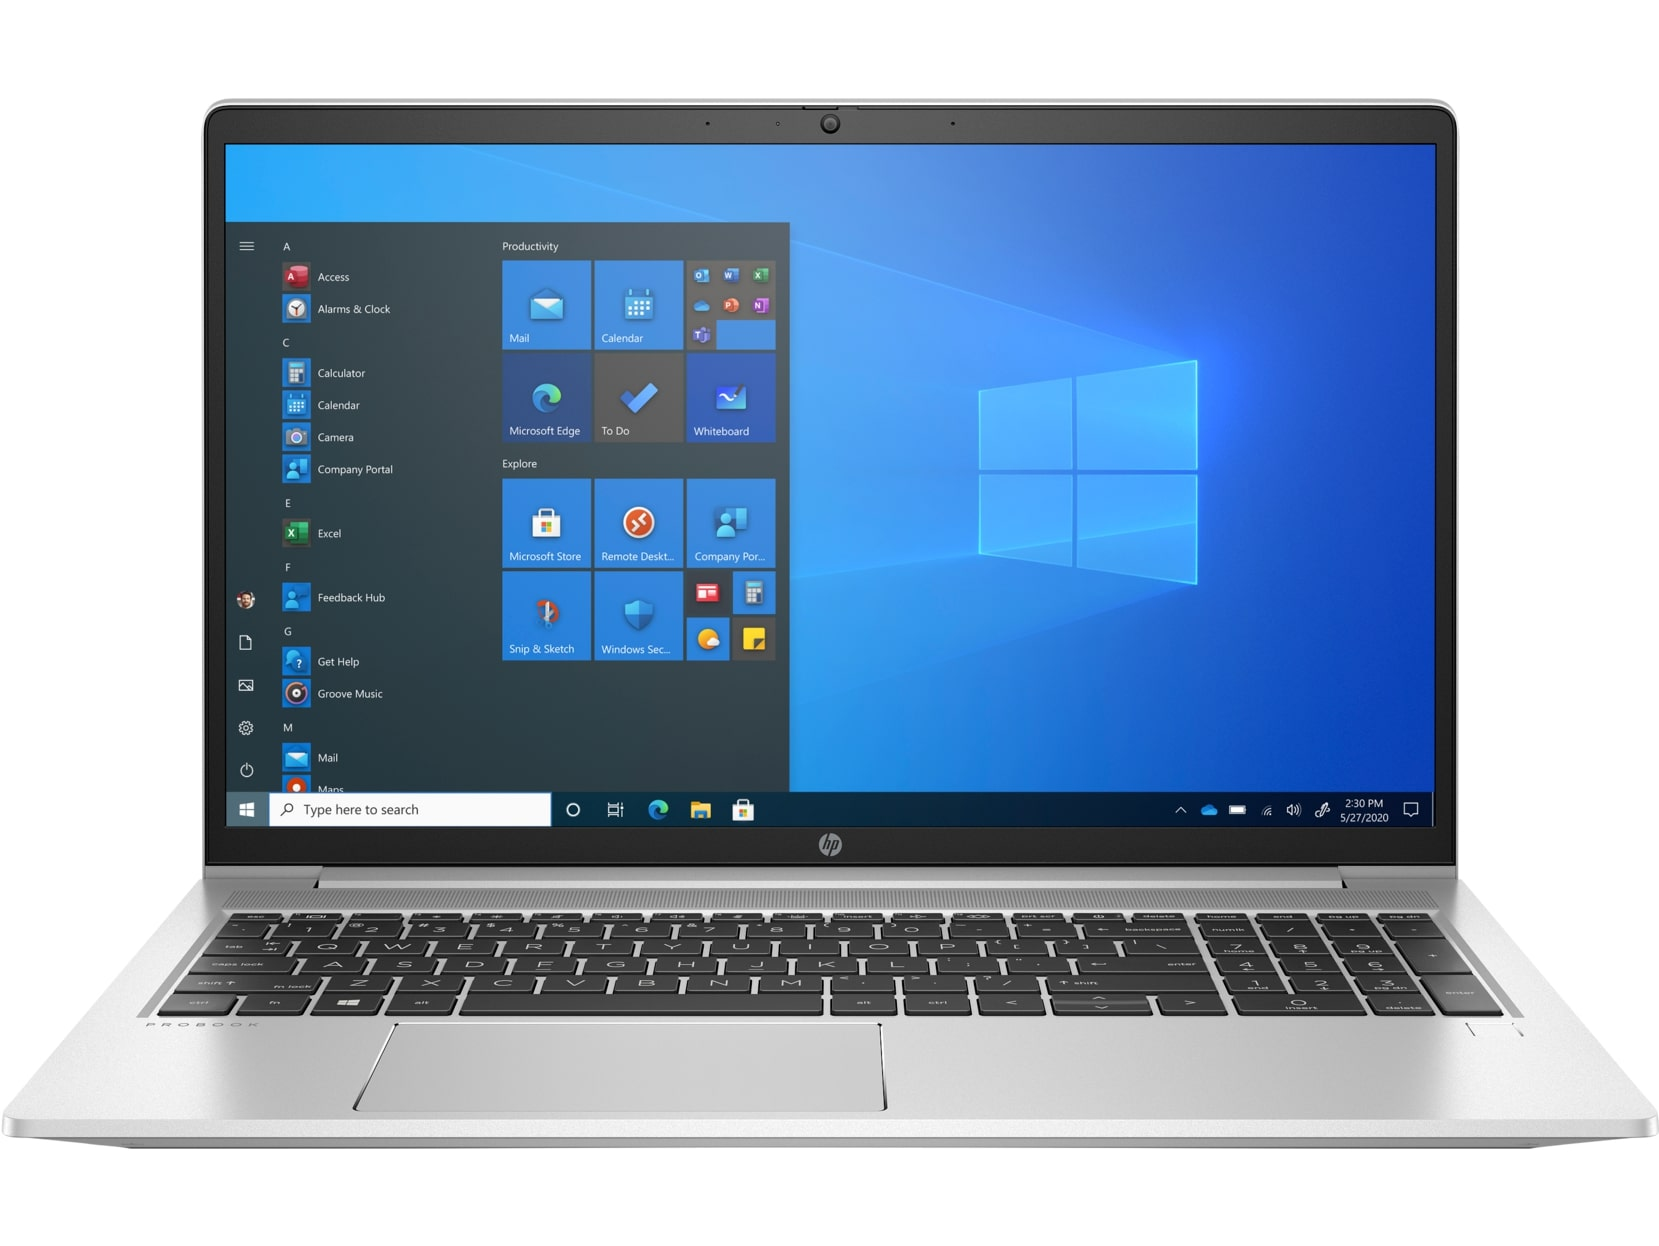 HP ProBook 450 G8 i3-1115G4 15.6 FHD UWVA 250 HD, 8GB, 256GB, FpS, ac, BT, Win10